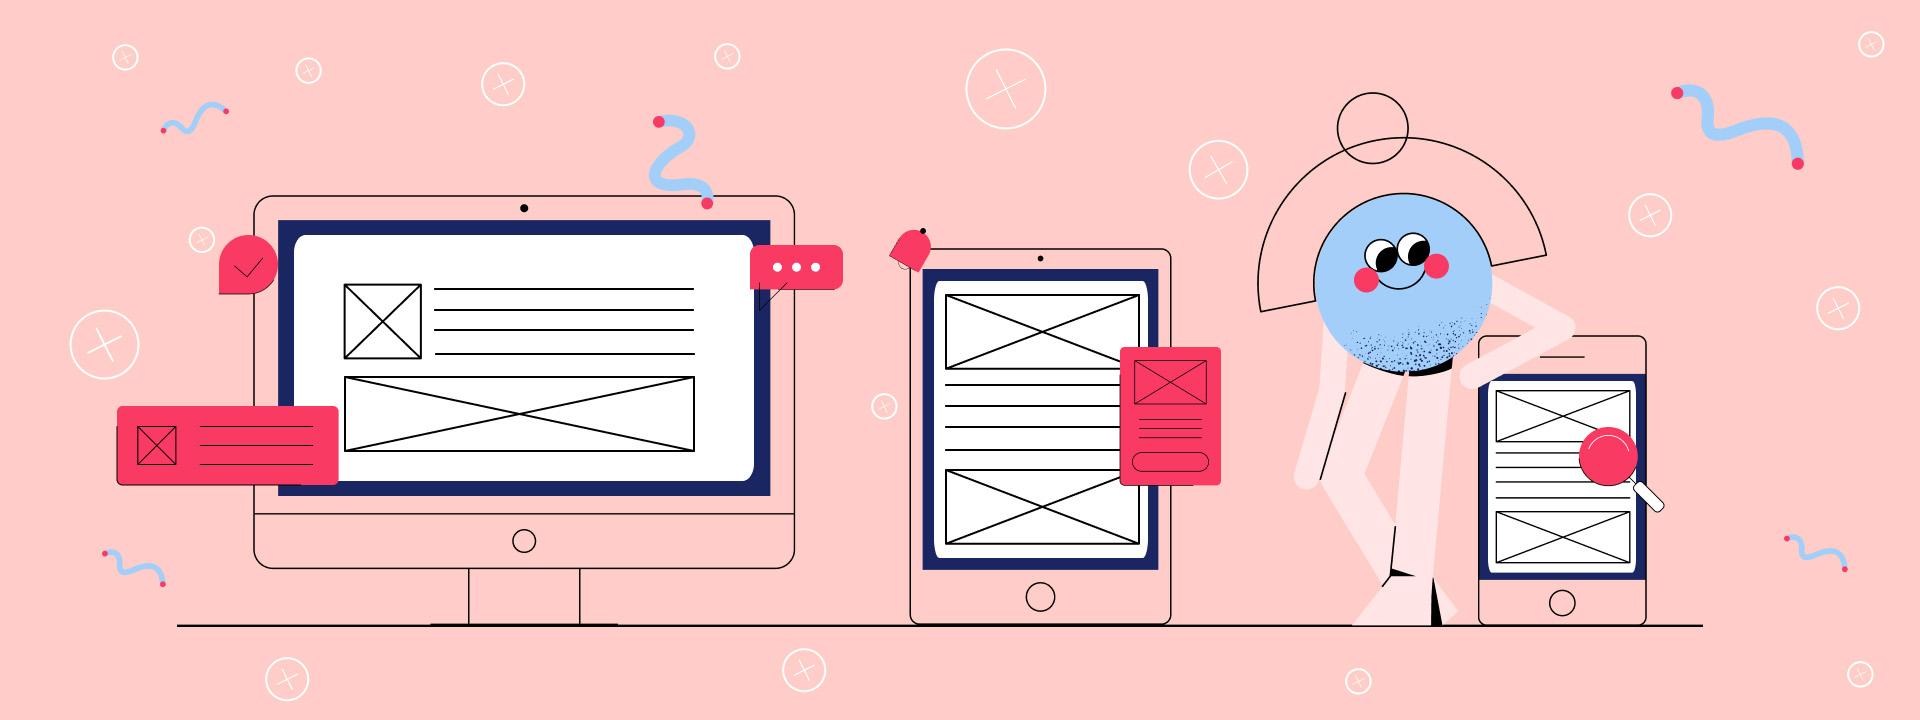 11 Actionable Ideas: Improve your Website UX for Maximum Conversion